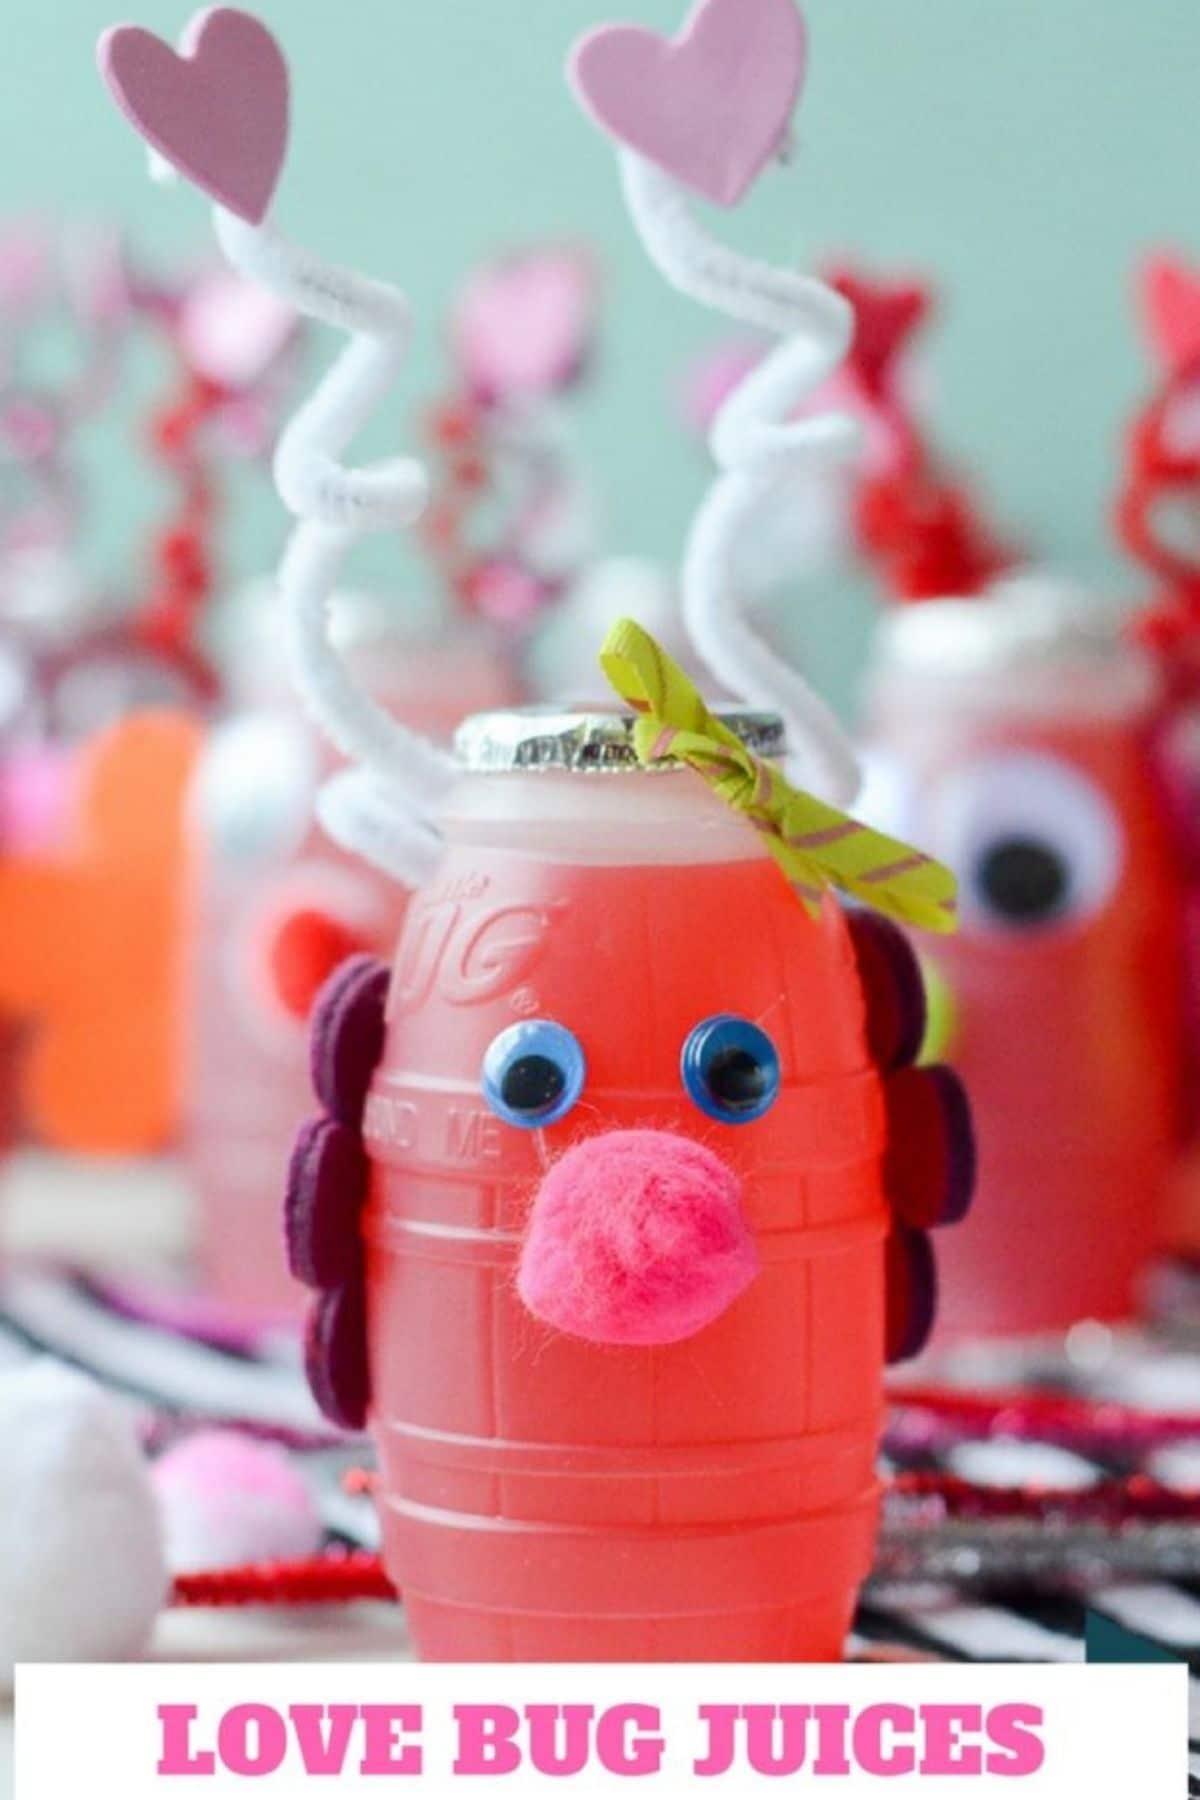 Love bug juices